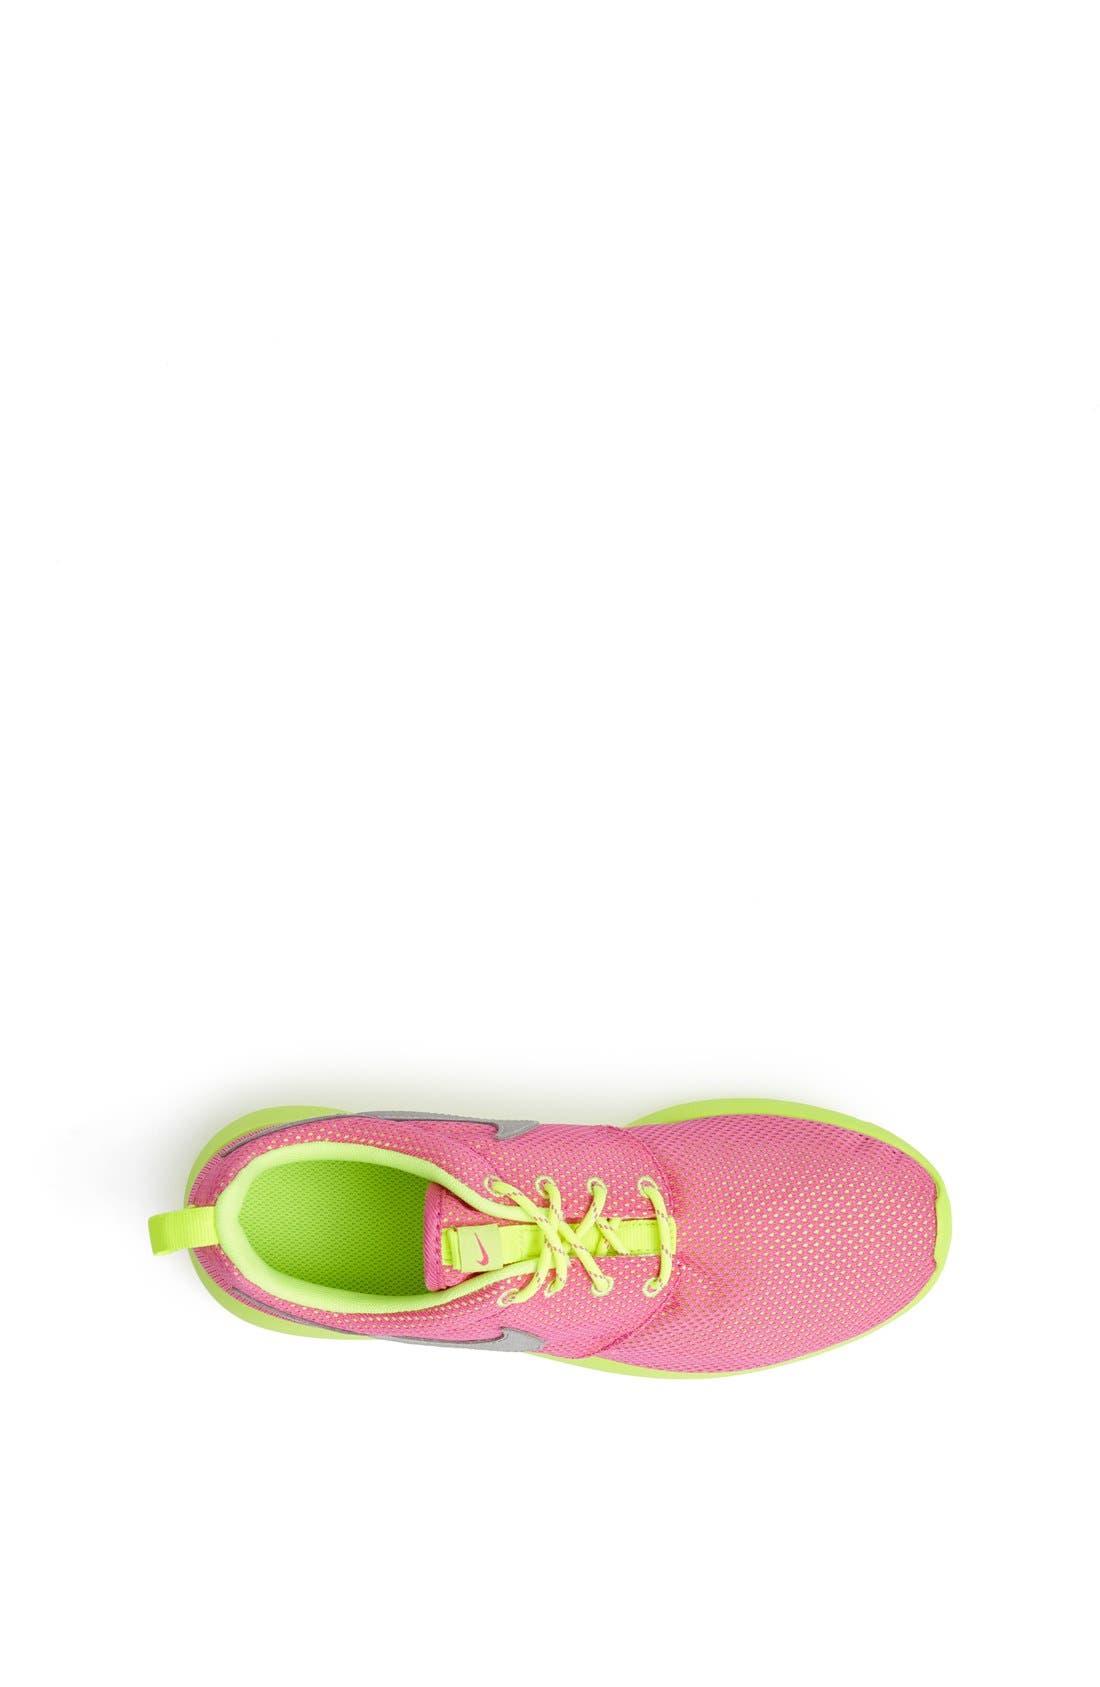 'Roshe Run' Athletic Shoe,                             Alternate thumbnail 100, color,